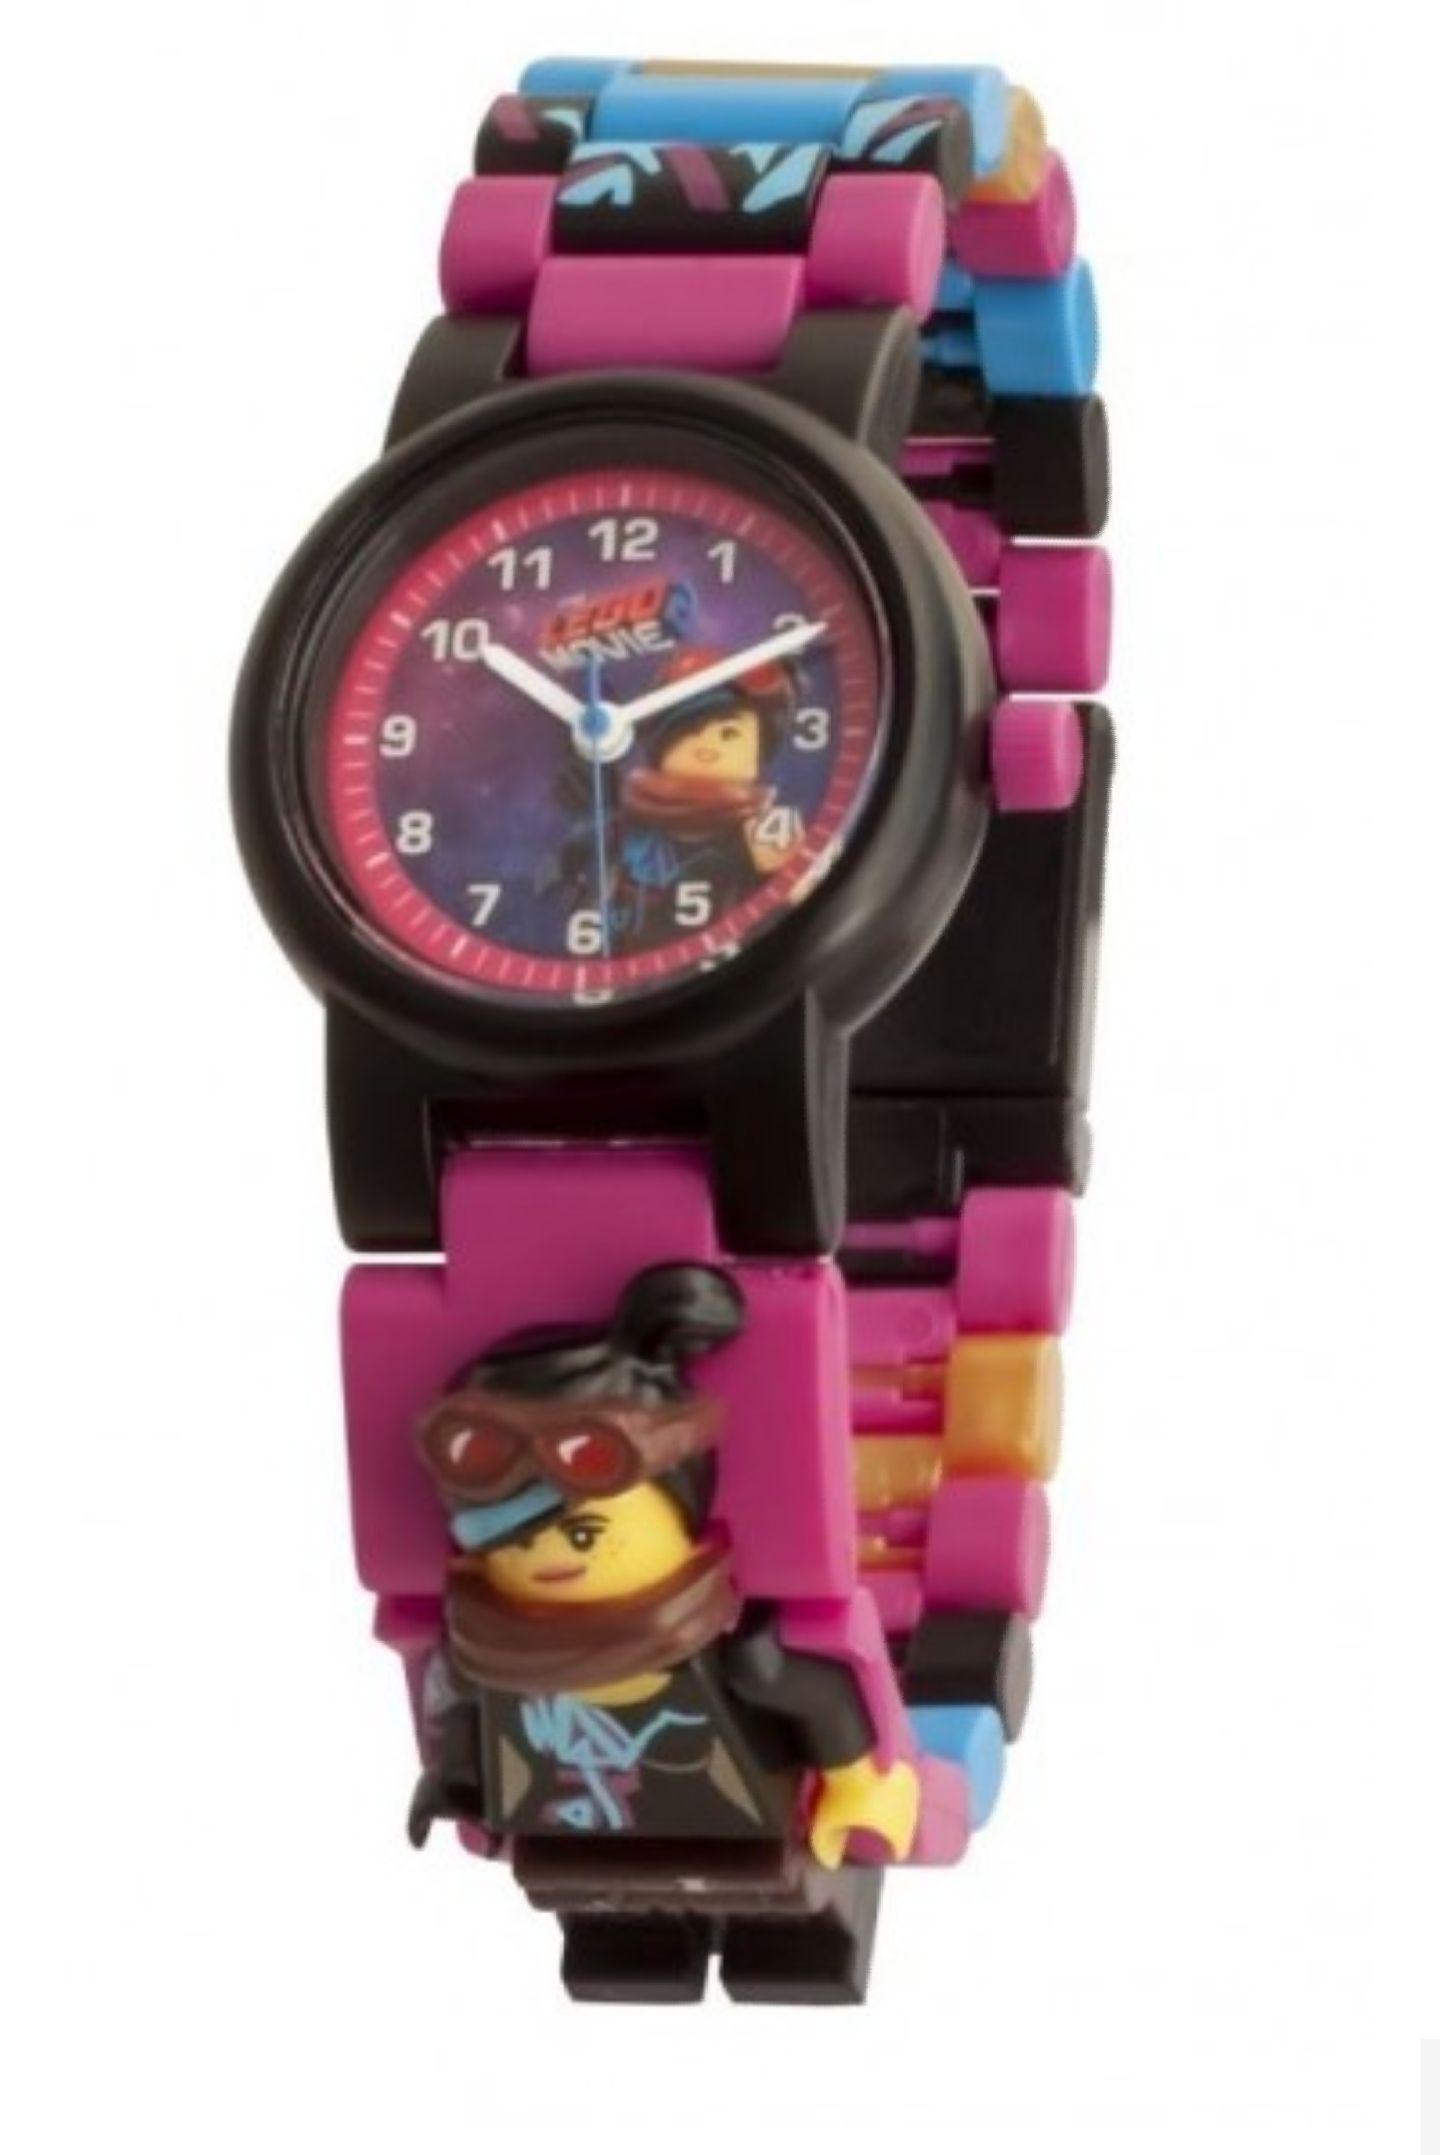 Lego movie 2 horloge